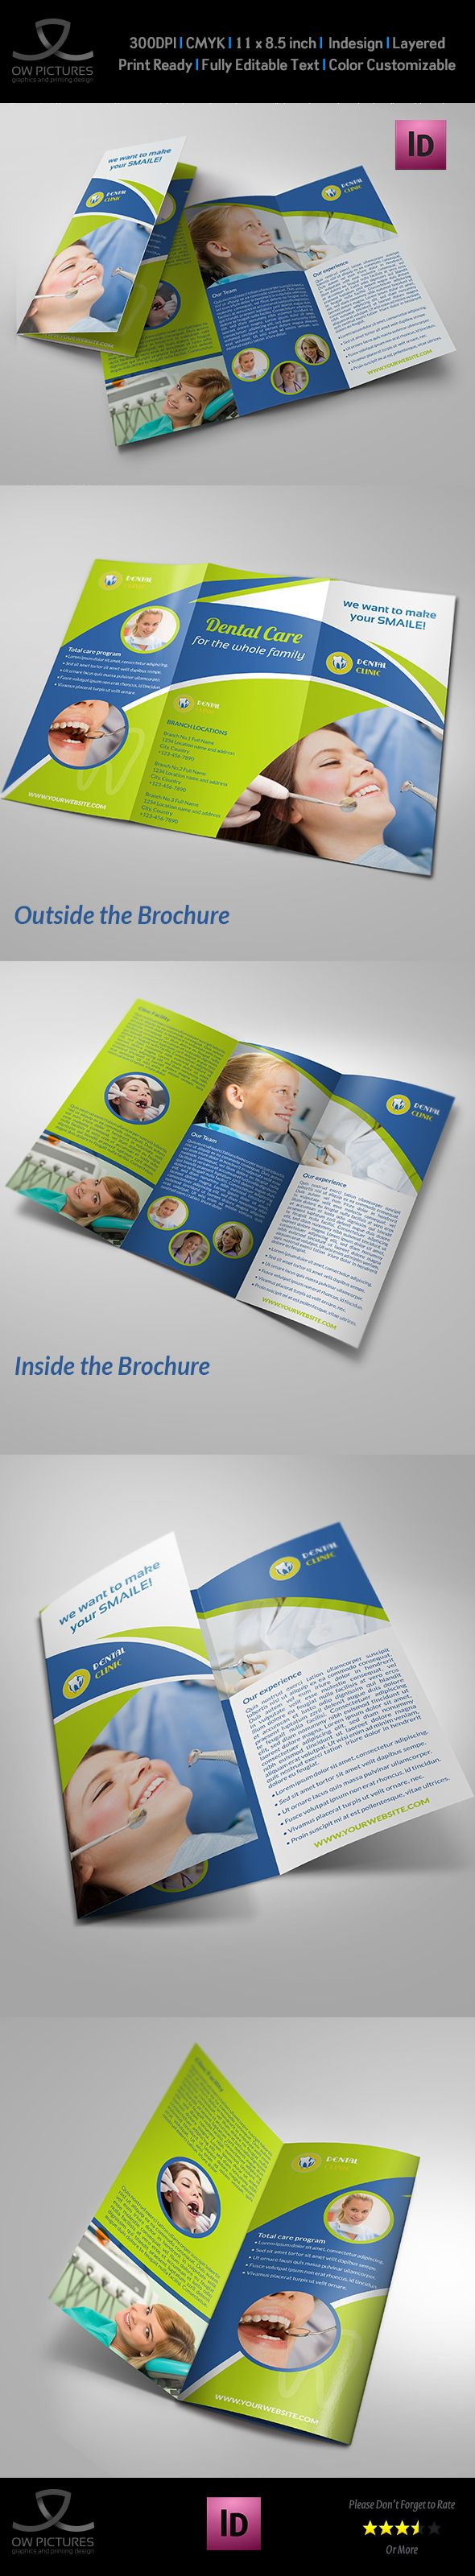 Dental Clinic Tri-Fold Brochure Vol.2 on Behance | dental ...